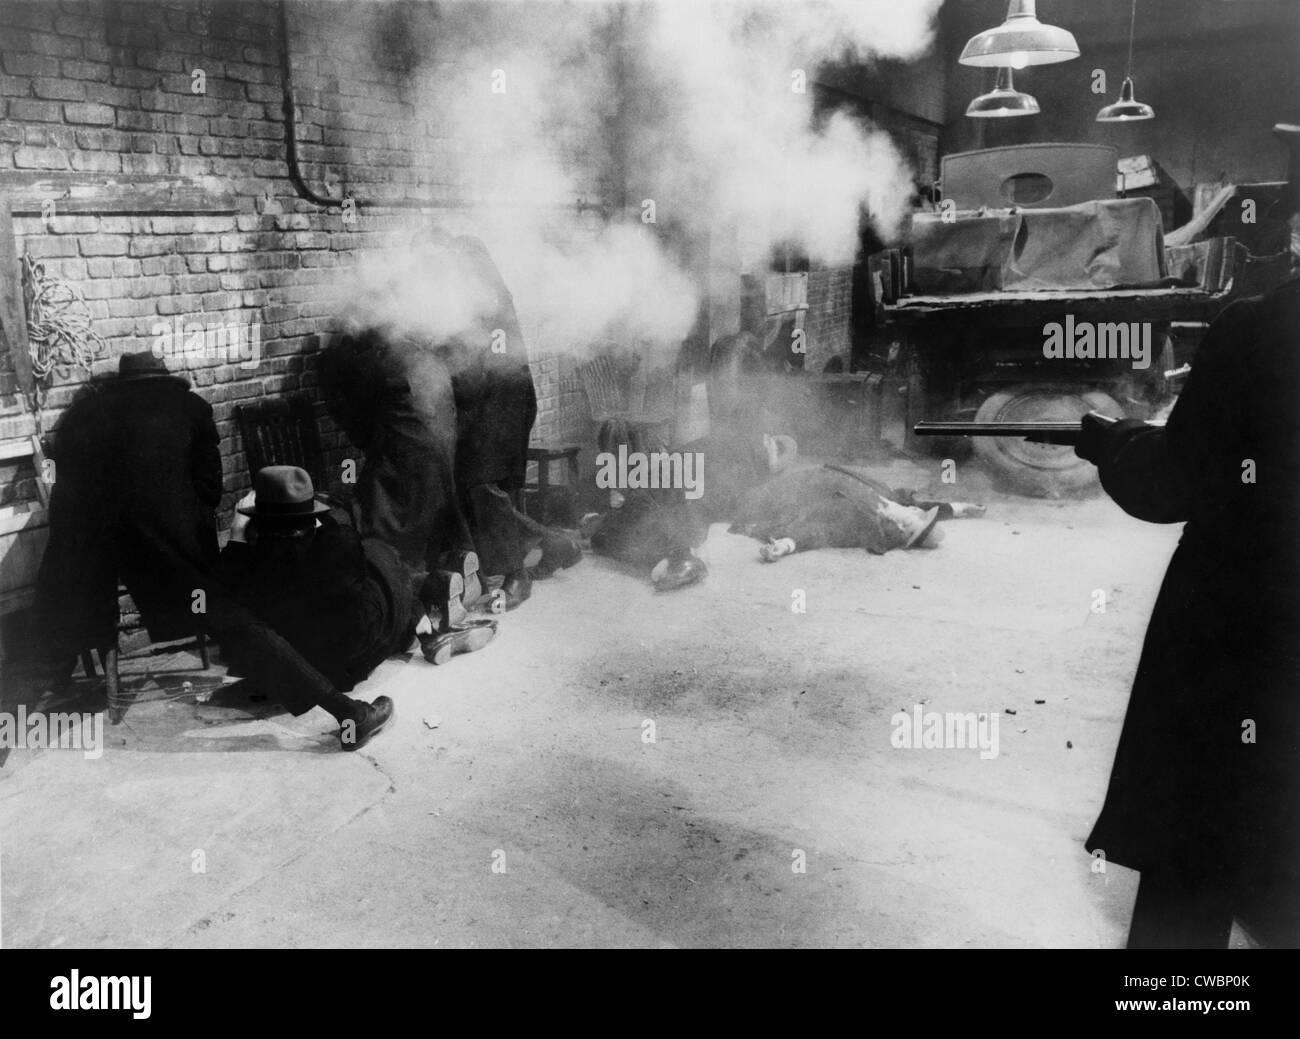 Re Enactment Of The St. Valentineu0027s Day Massacre From Roger Cormanu0027s 1967  Film, THE ST. VALENTINEu0027S DAY MASSACRE